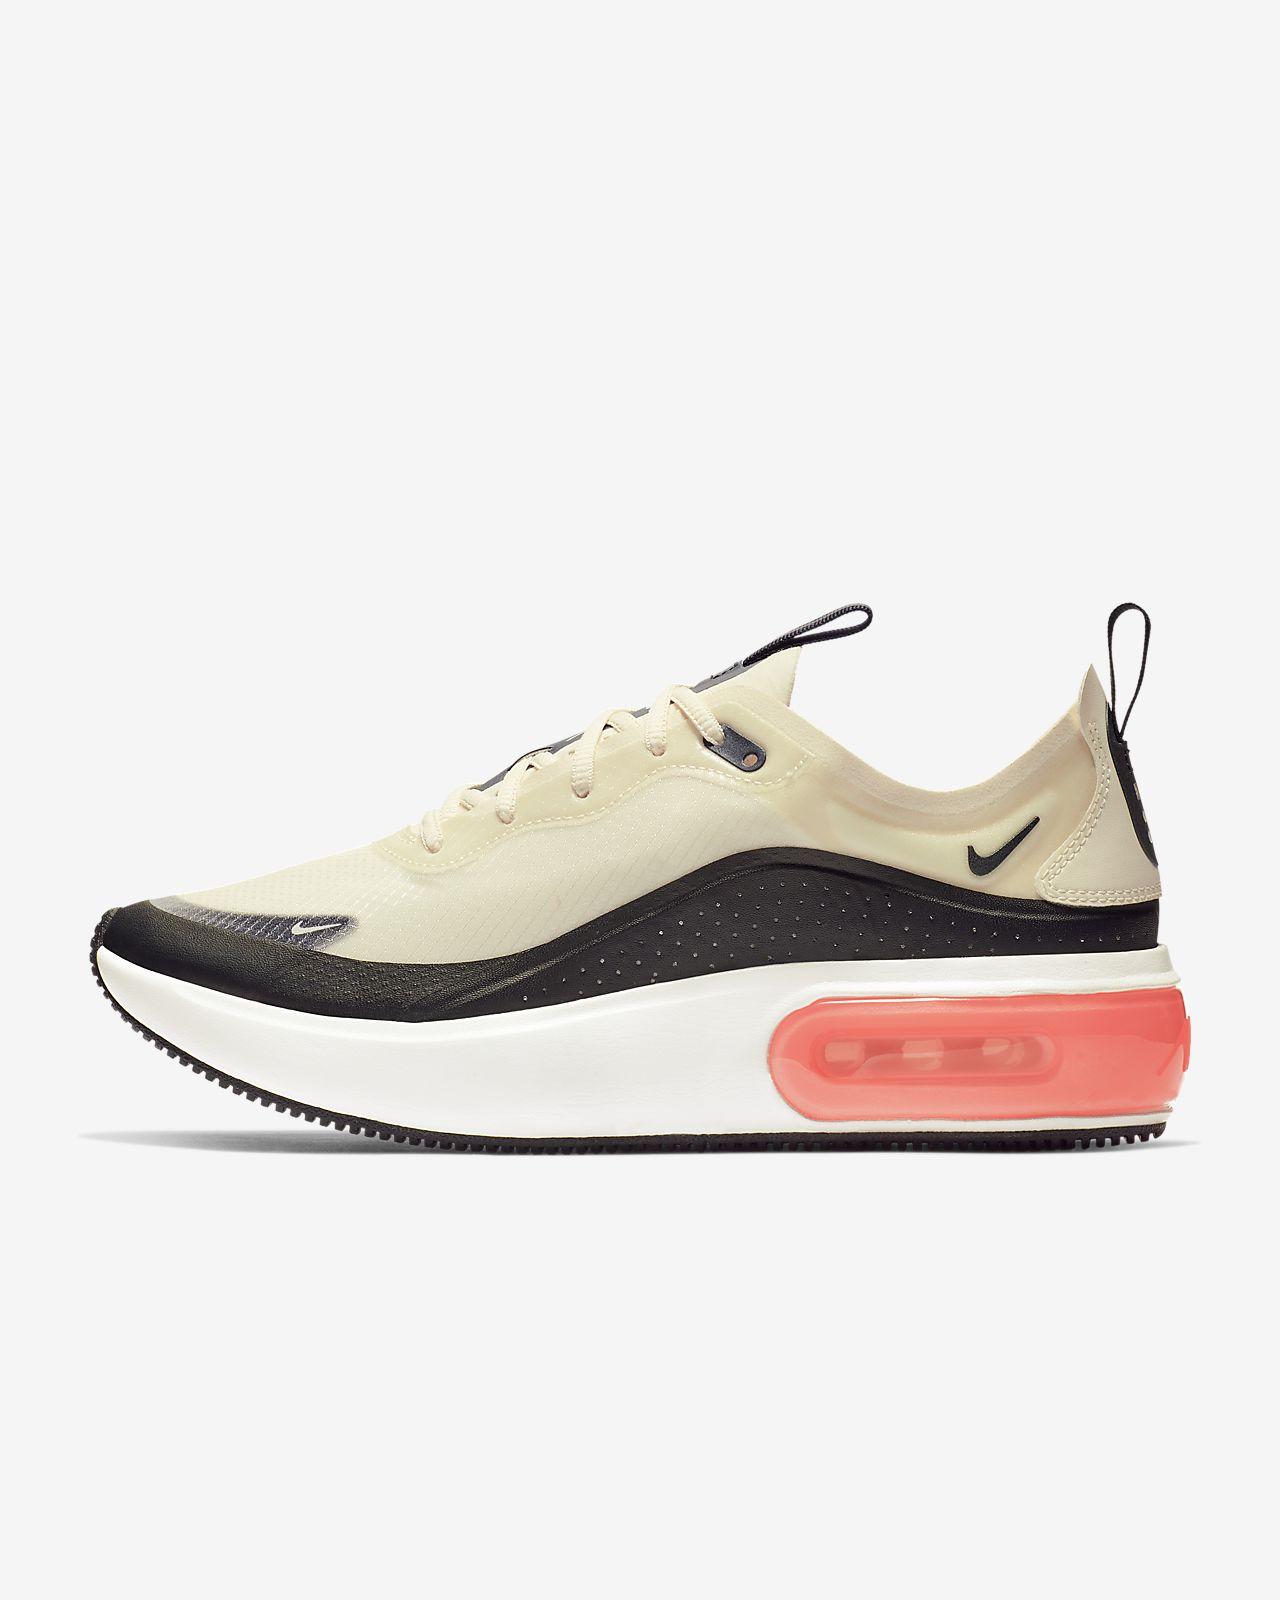 online store 4653d 731c0 ... Chaussure Nike Air Max Dia SE